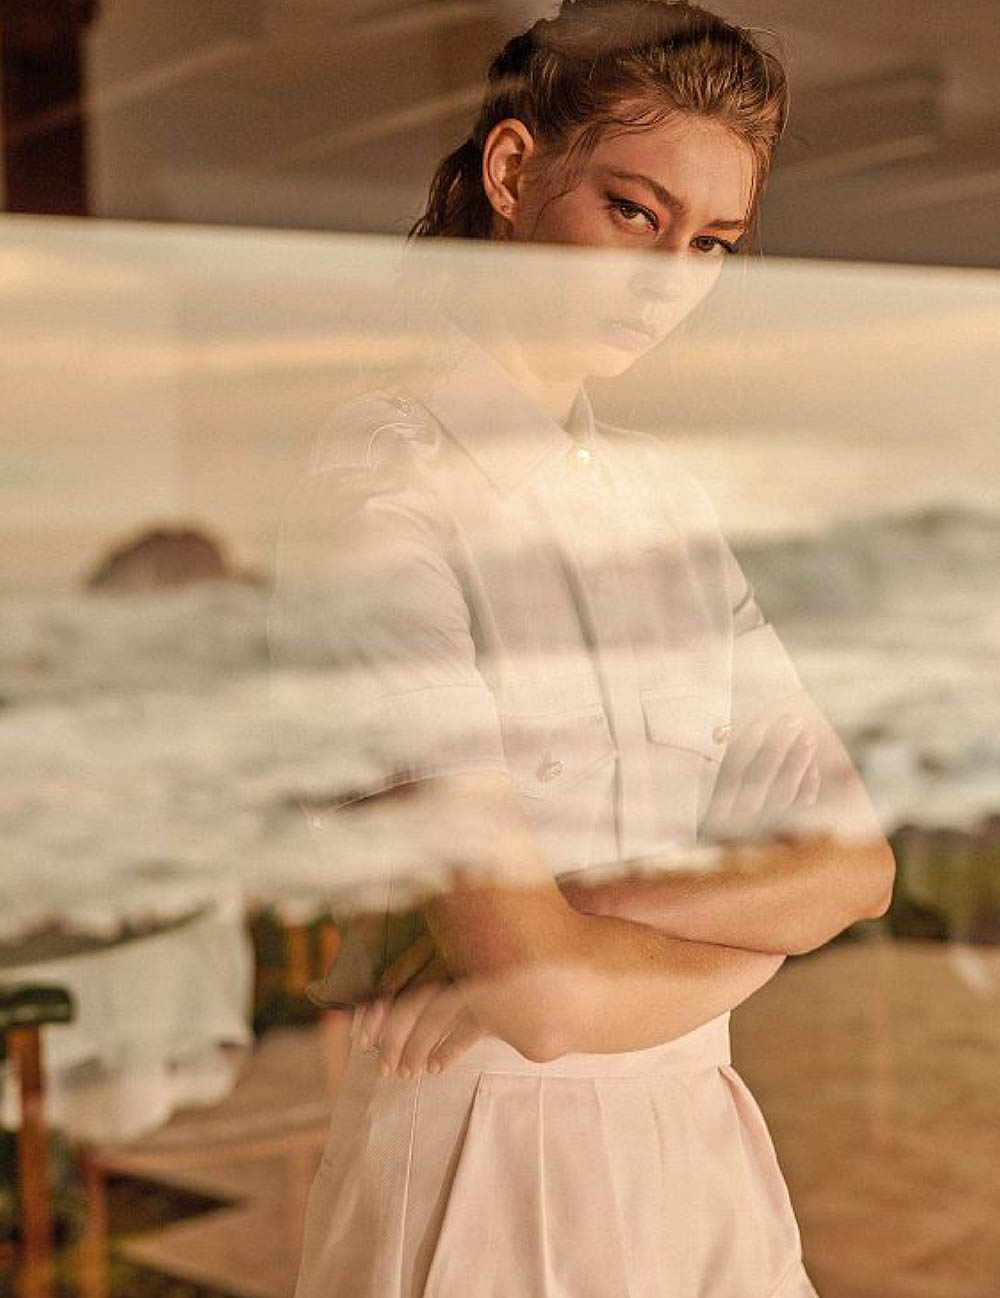 Ondria Hardin by Frederico Martins for Amica Magazine April 2020